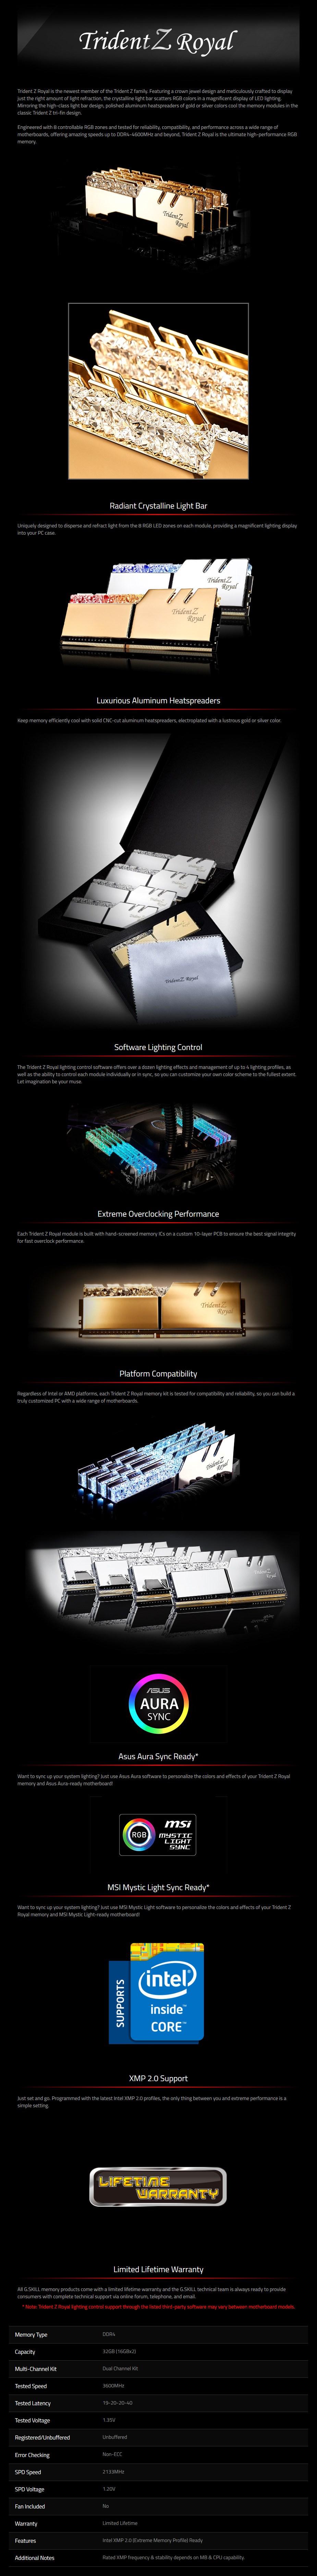 G.SKill Trident Z RGB Royal 32GB (2x 16GB) DDR4 CL19 3600MHz Memory - Silver - Desktop Overview 1